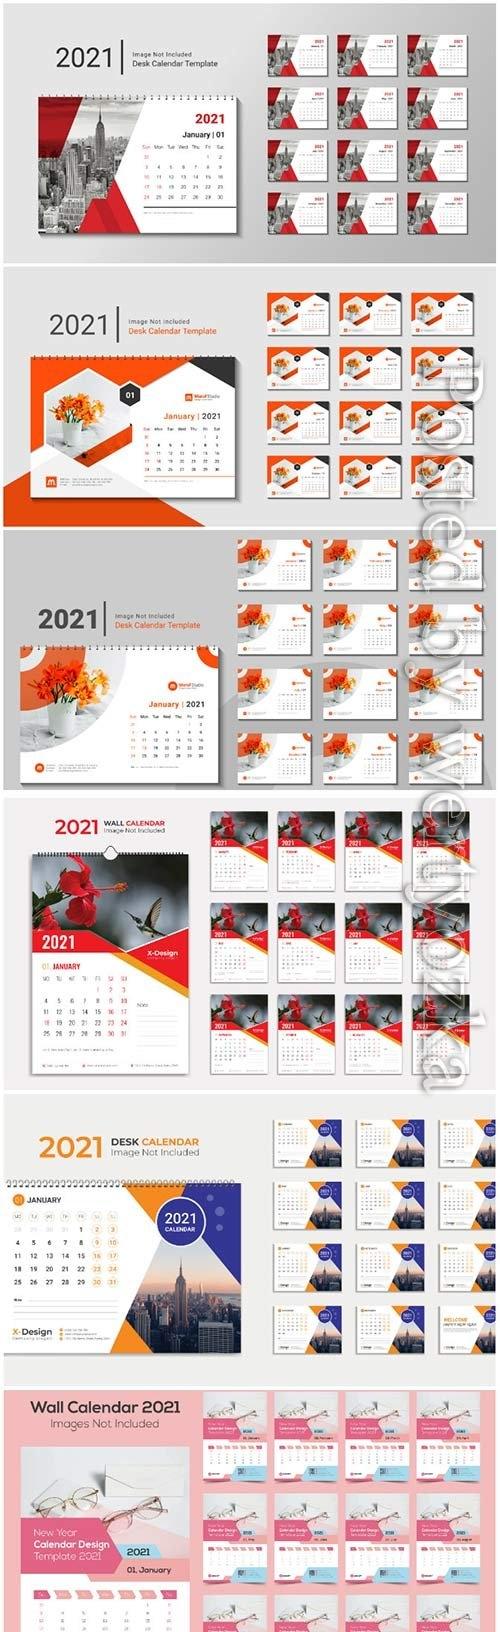 Desk calendar 2021 template design for new year vol 2